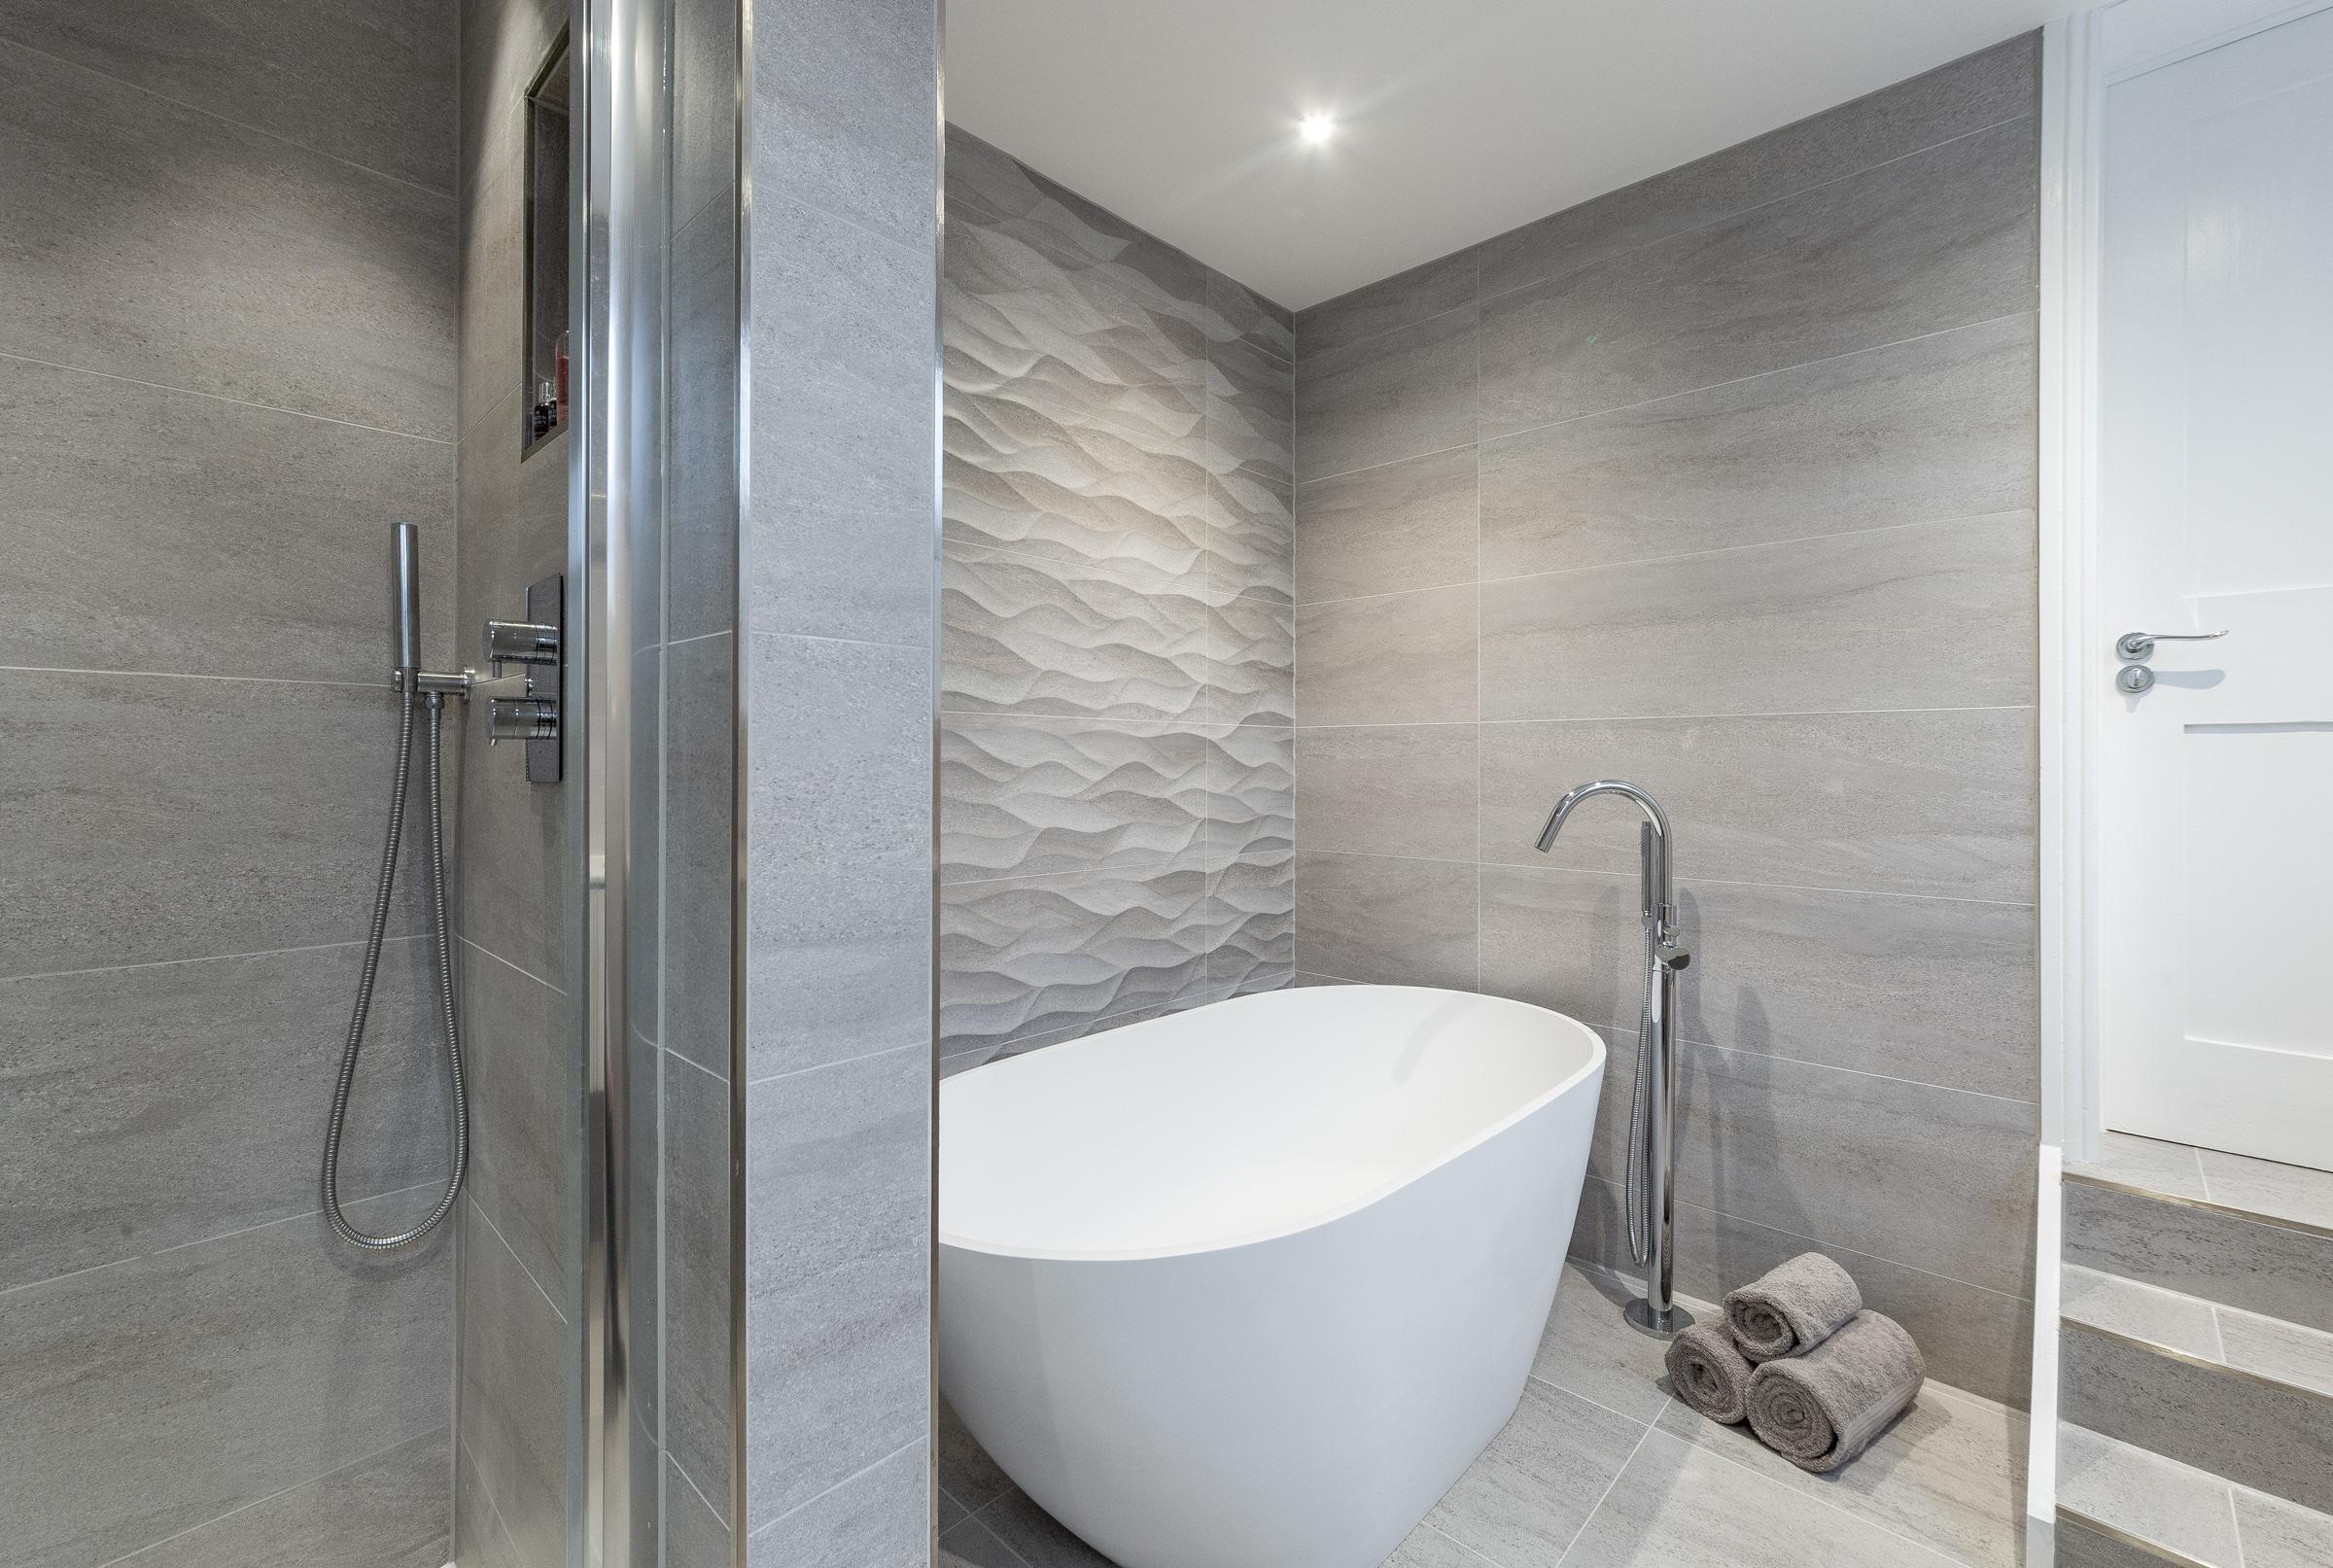 Modern wetroom style bathroom